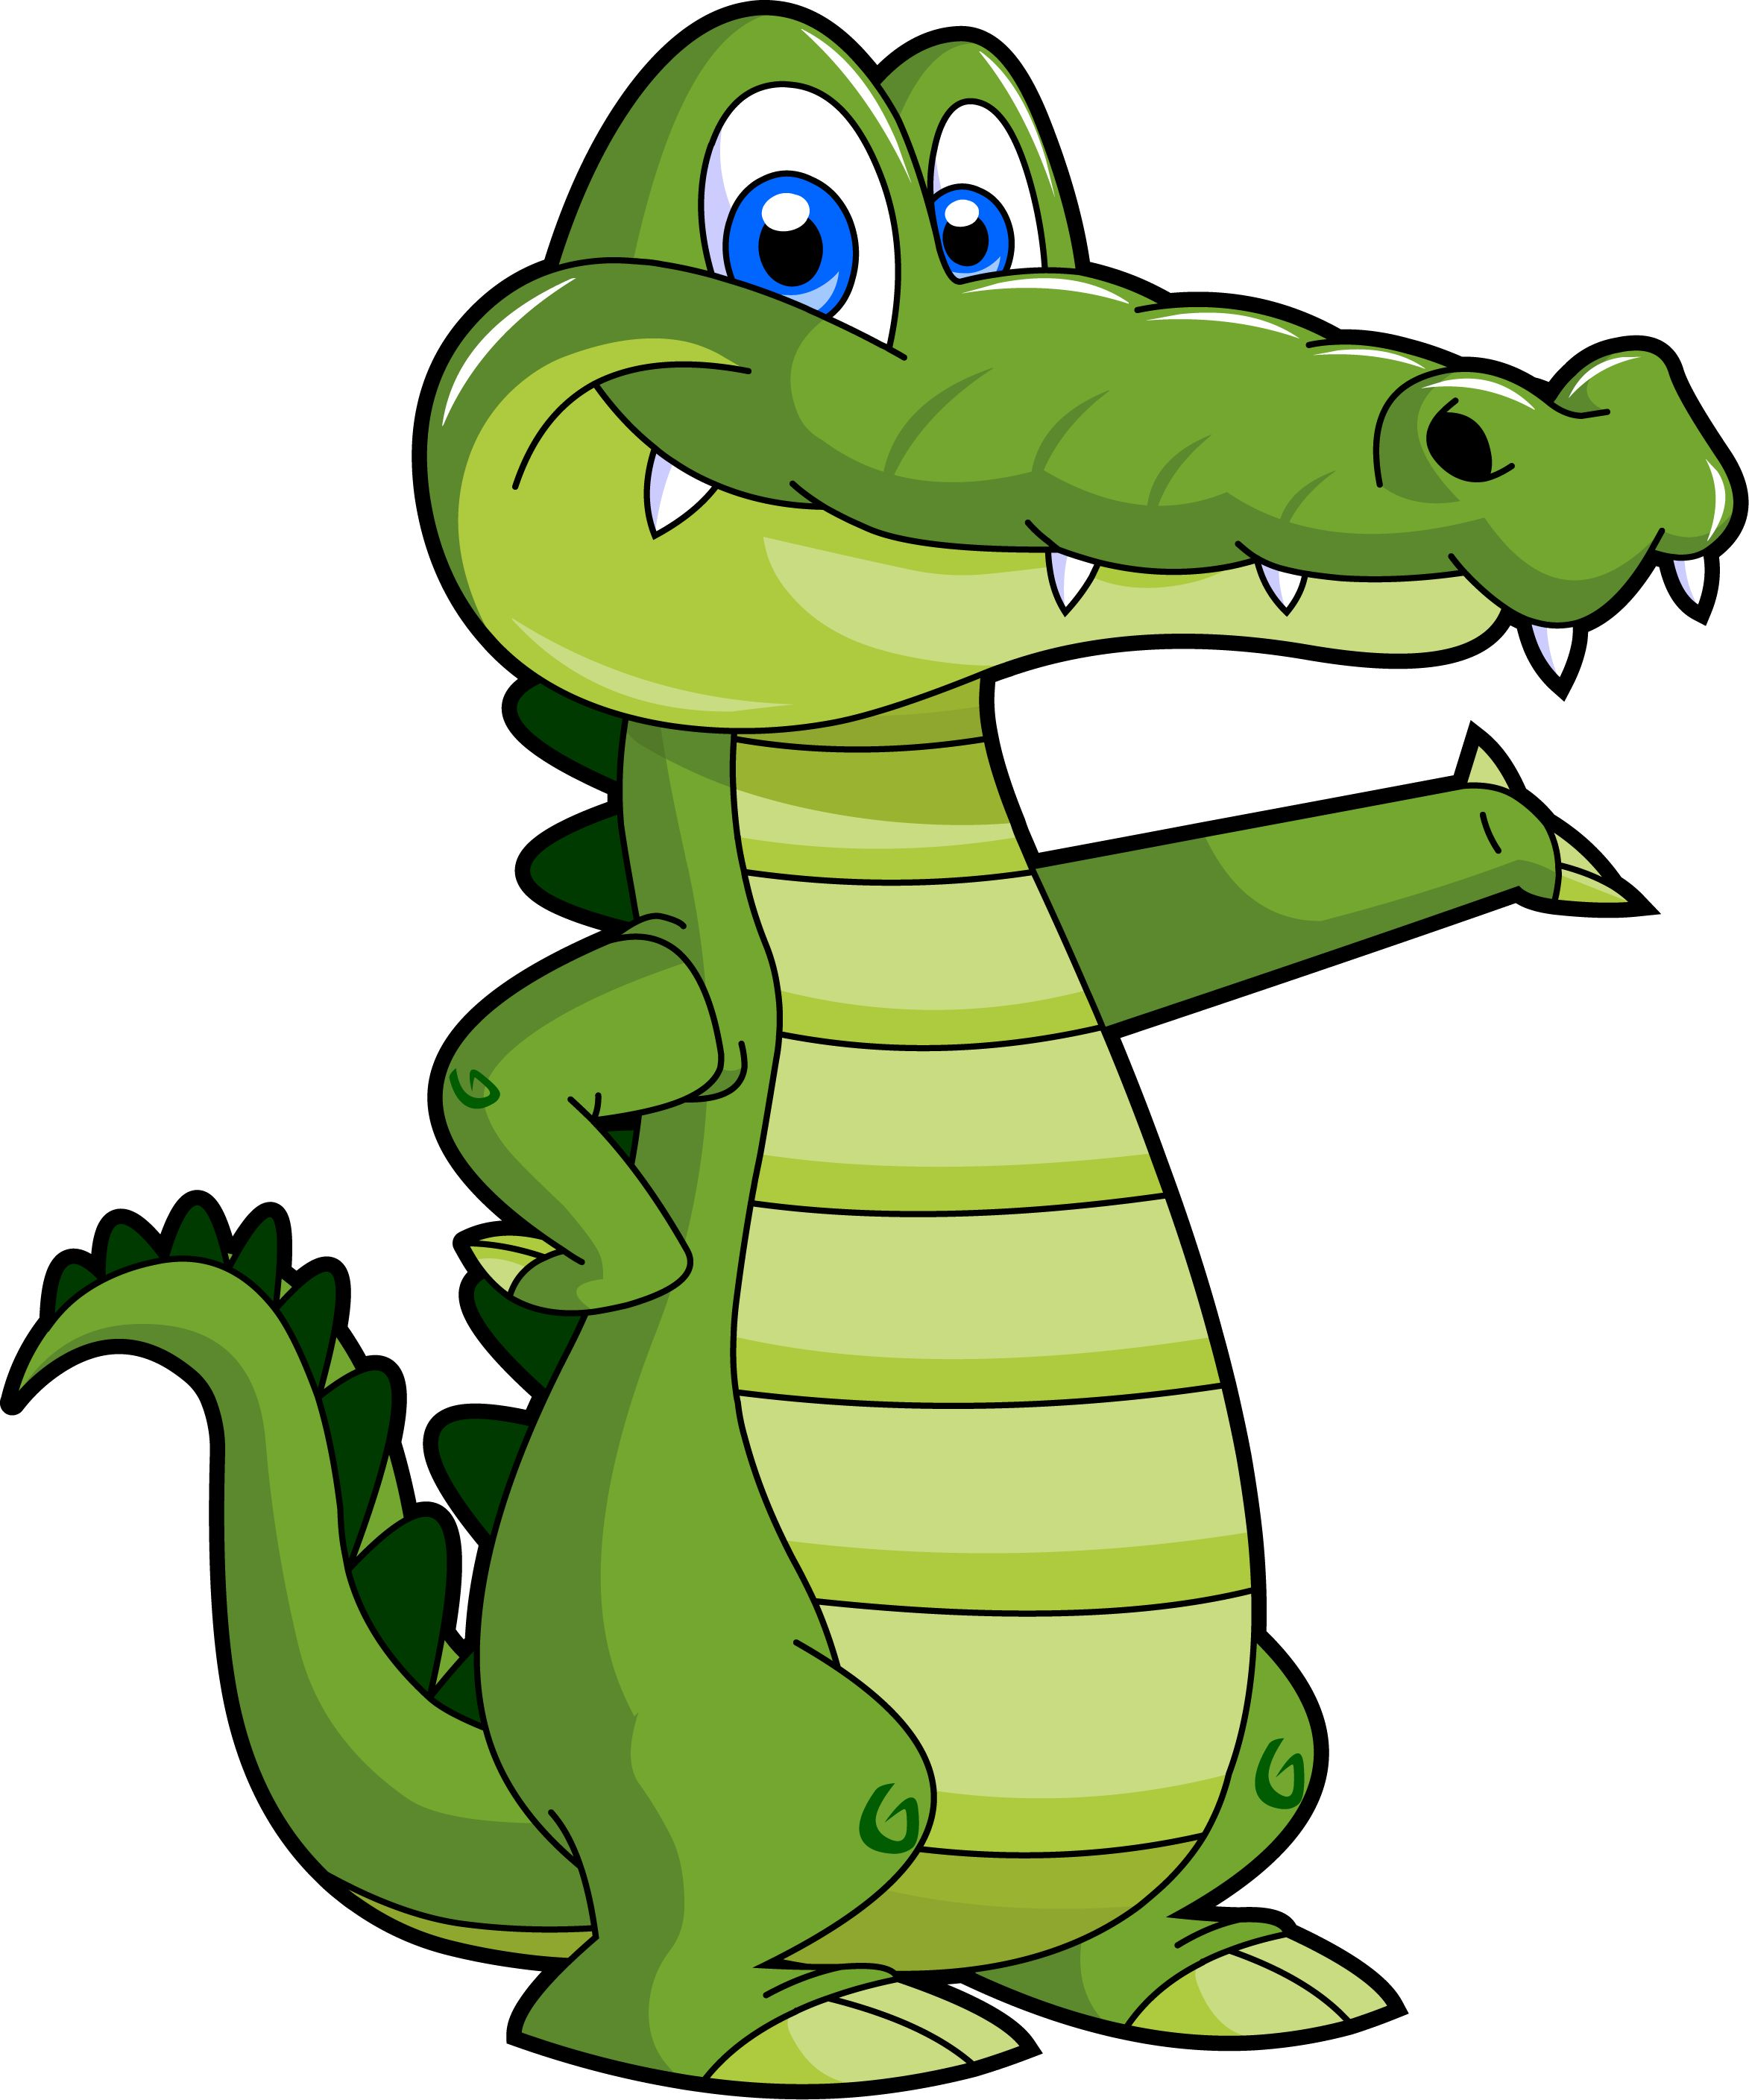 Alligator clipart animated. Girls cartoon